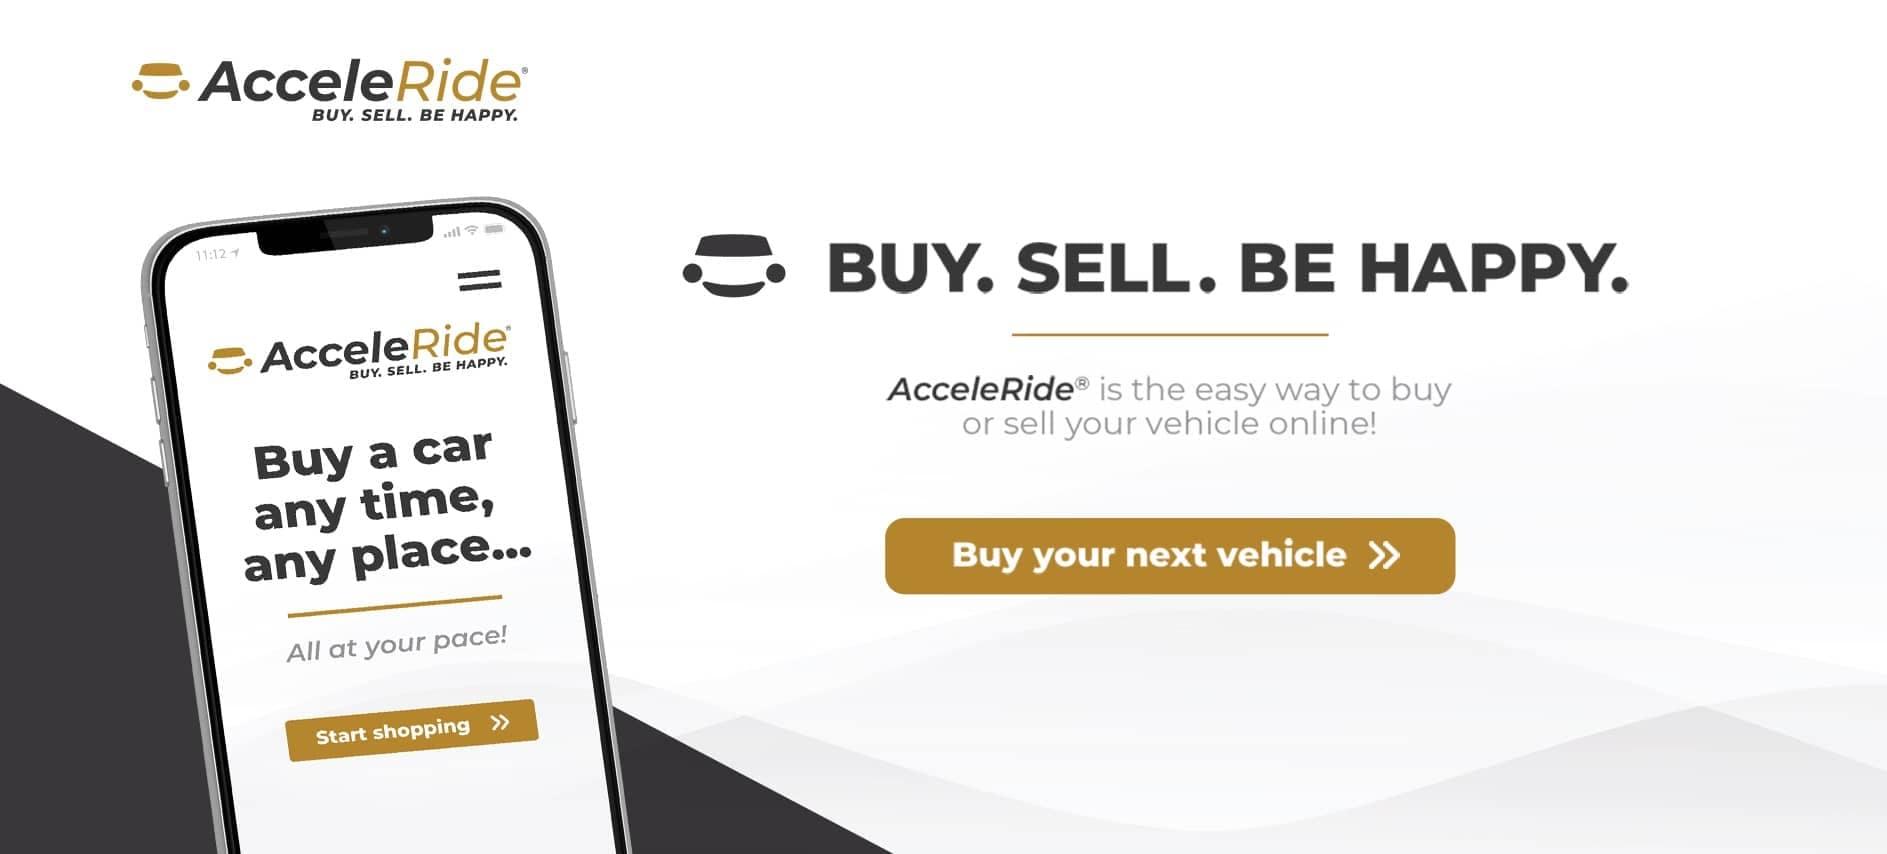 AcceleRide: Buy. Sell. Be Happy.